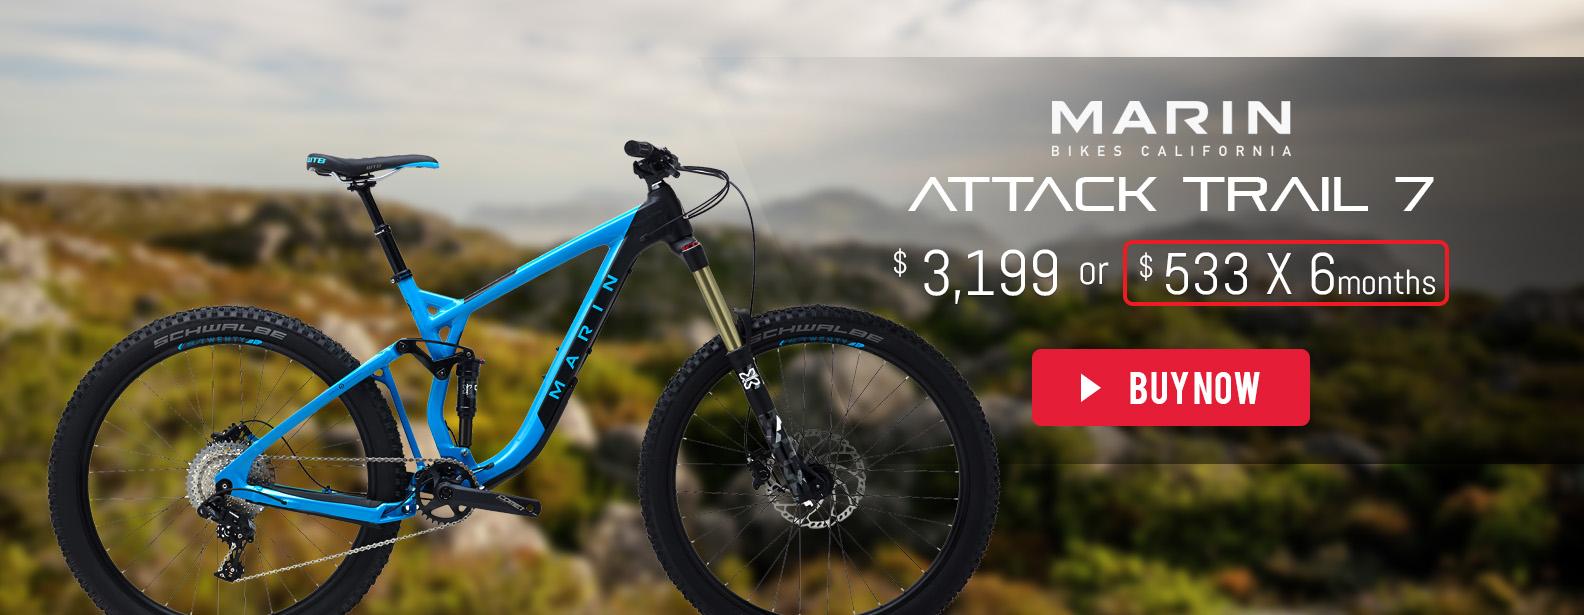 Marin Attack Trail 7 Bike